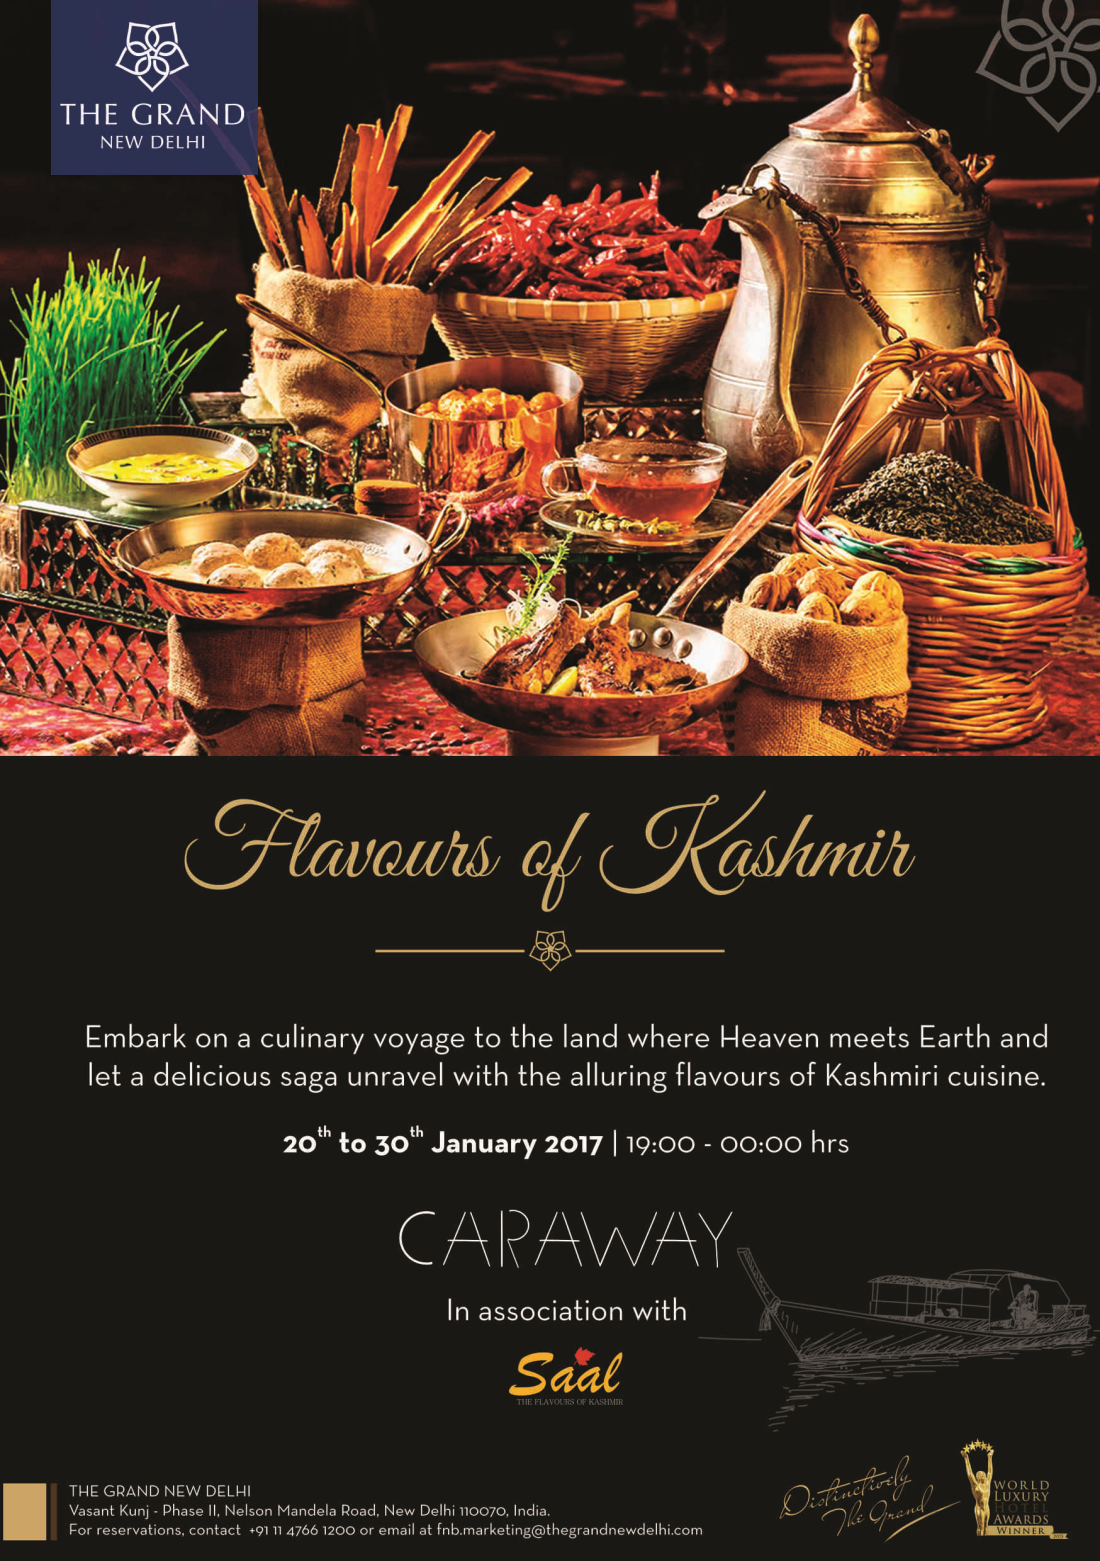 The Grand New Delhi New Delhi Kashmiri food A5 front The Grand New Delhi